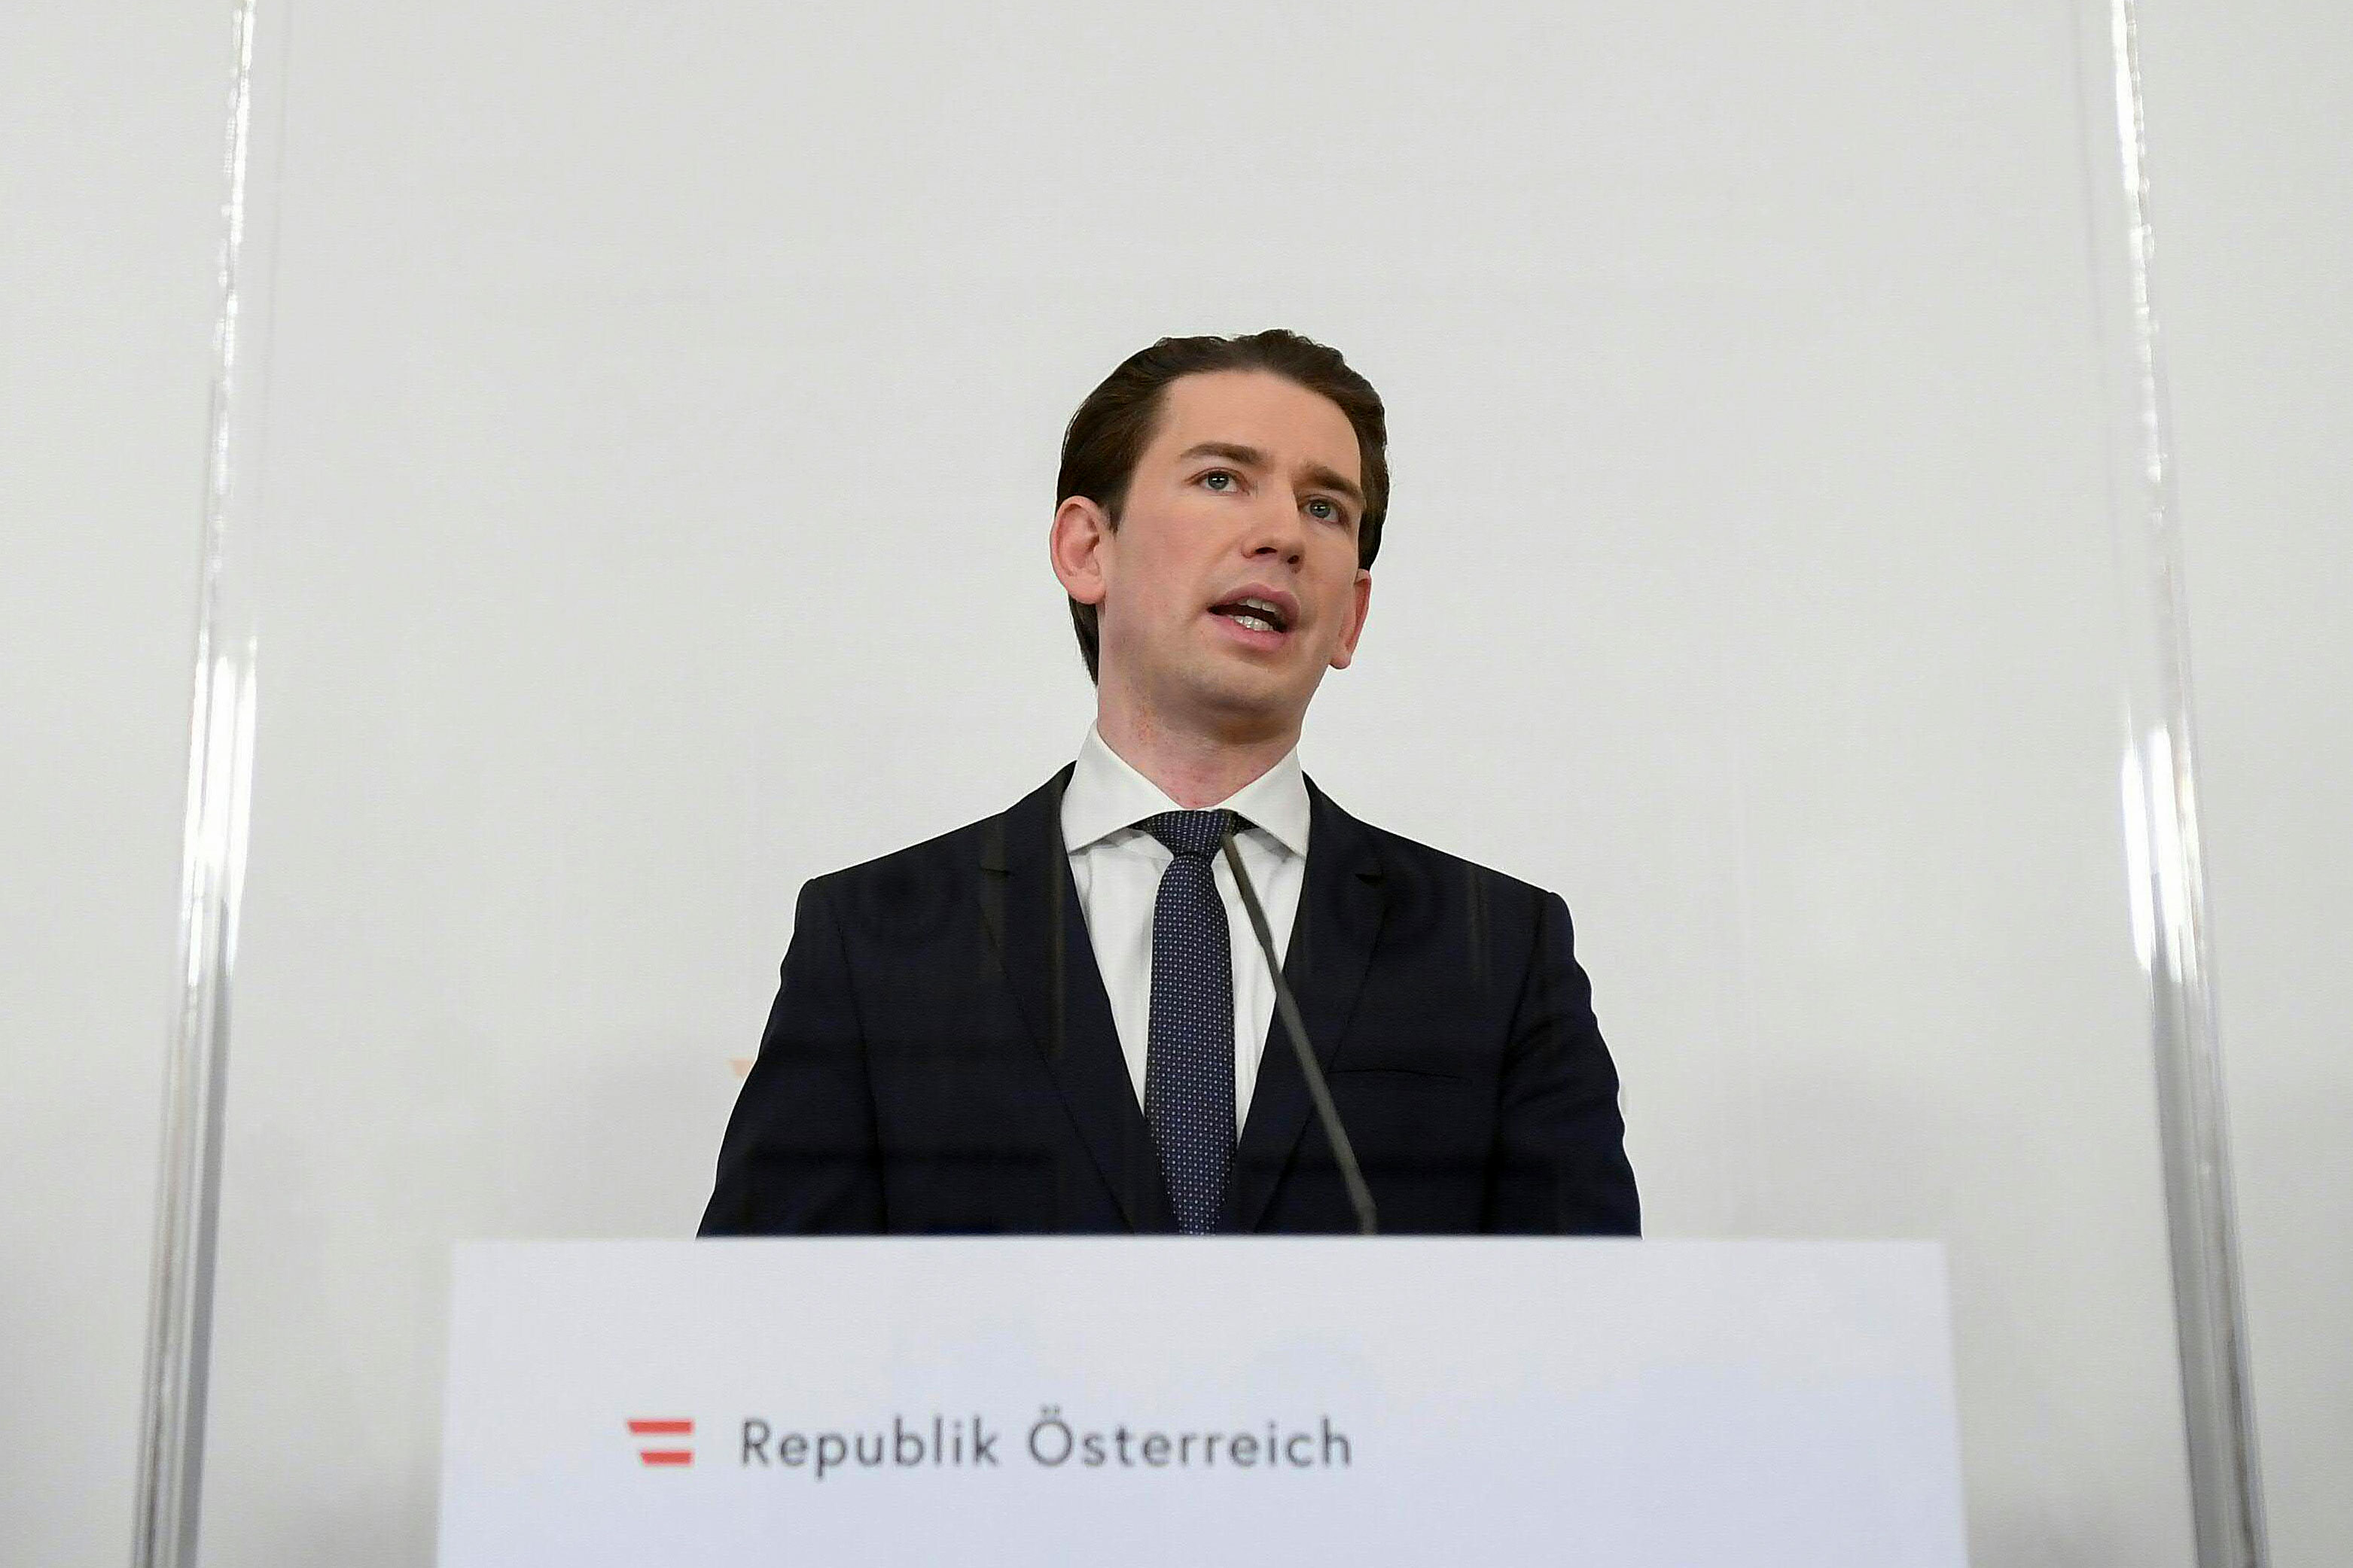 Austrian Chancellor Sebastian Kurz speaks at a press conference in Vienna, Austria, on February 1.